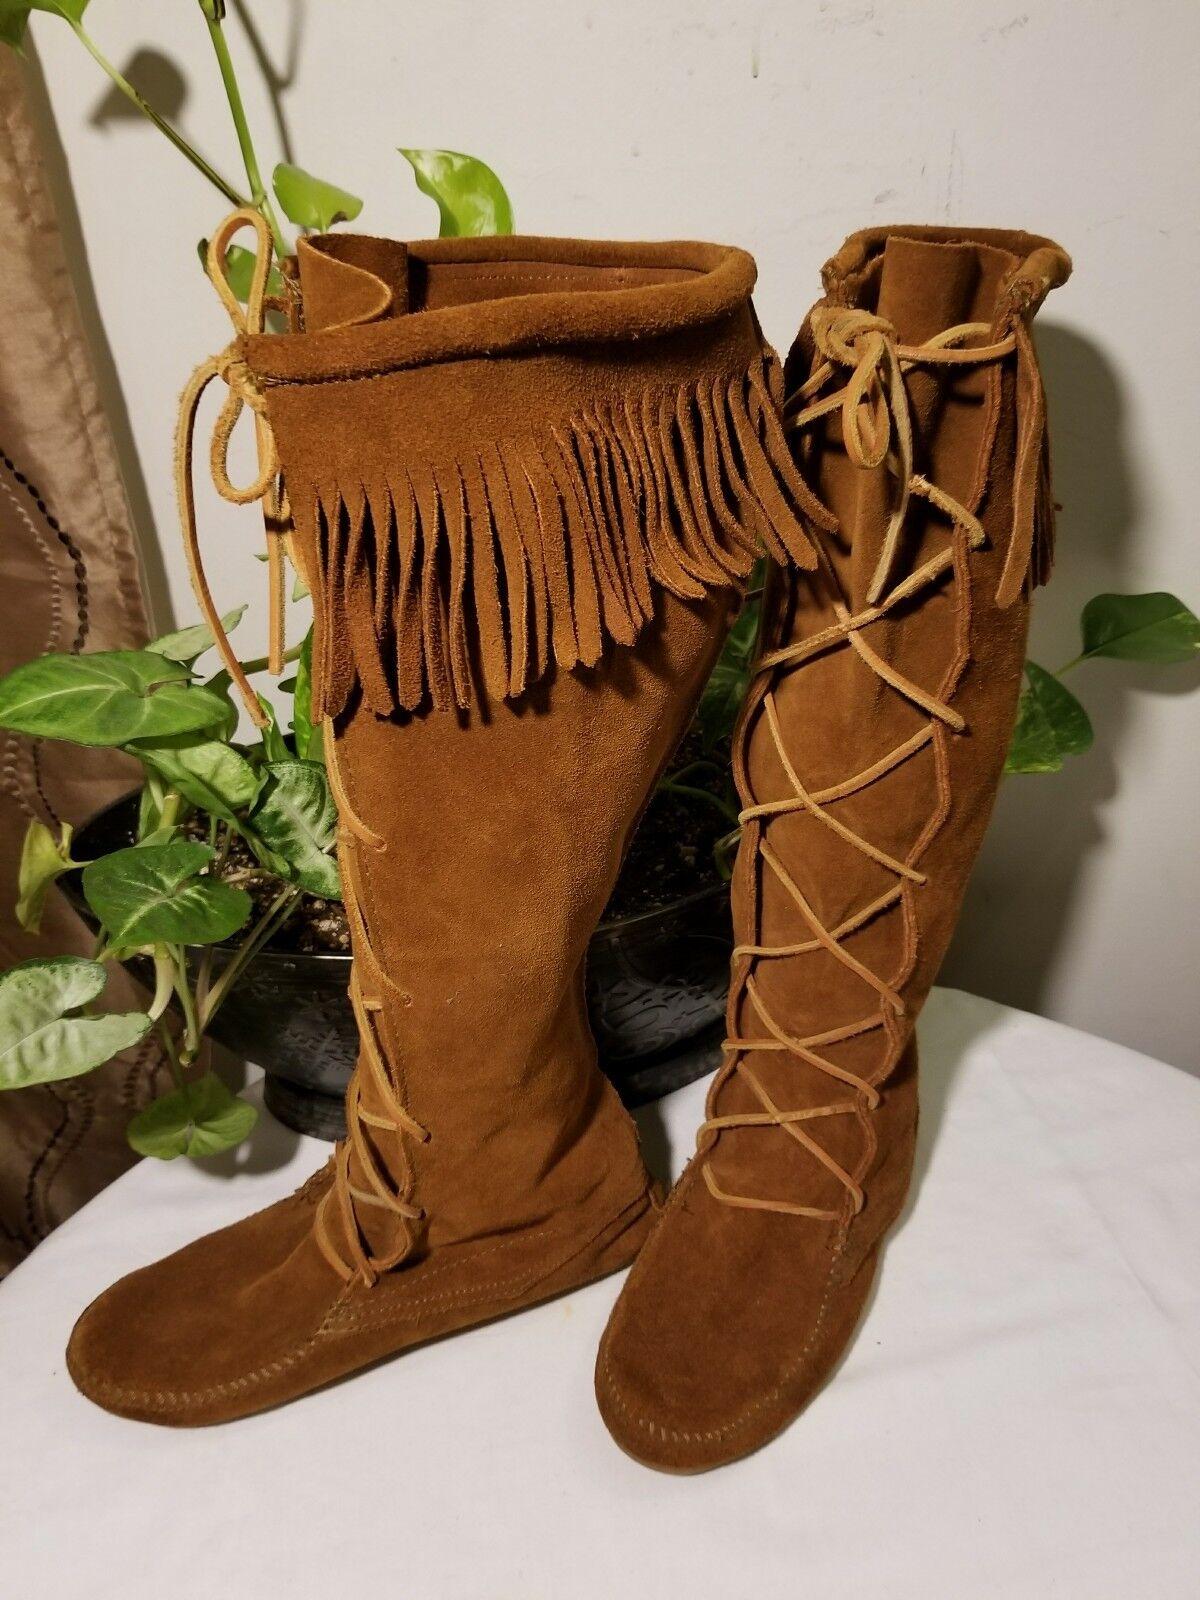 Minnetonka roya parda Flecos de Gamuza Mocasín rodilla alta botas talla 7